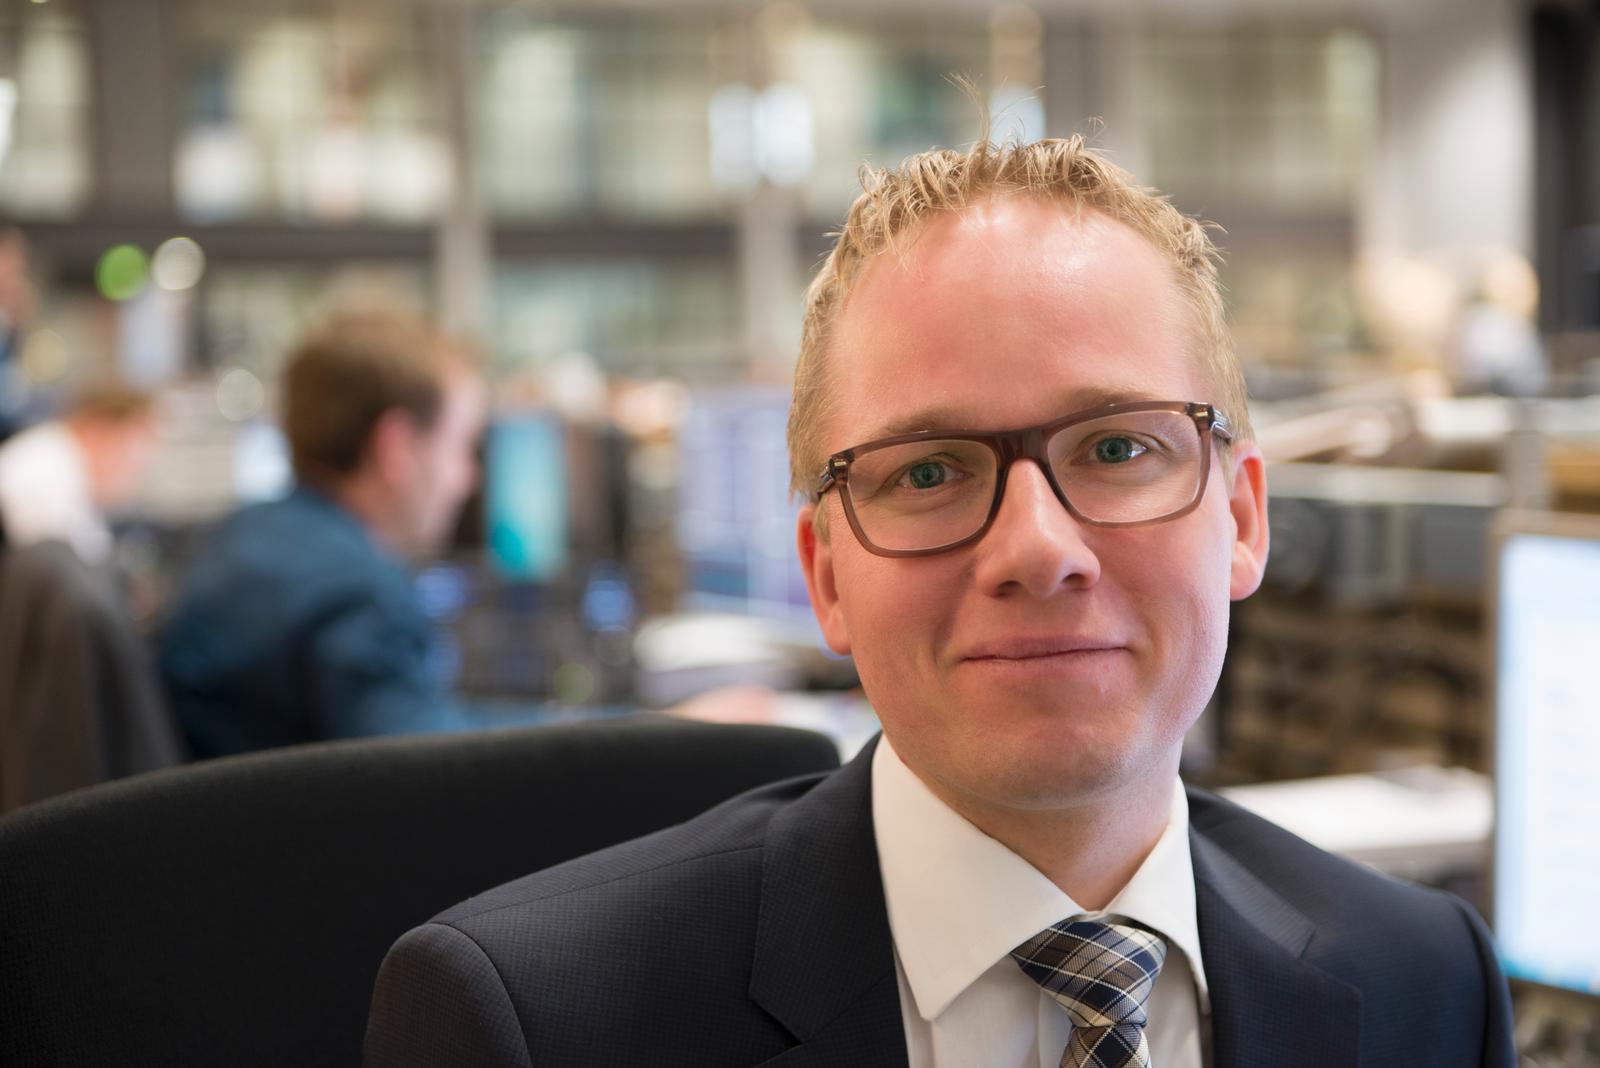 Aktieanalysechef Jacob Pedersen fra Sydbank.